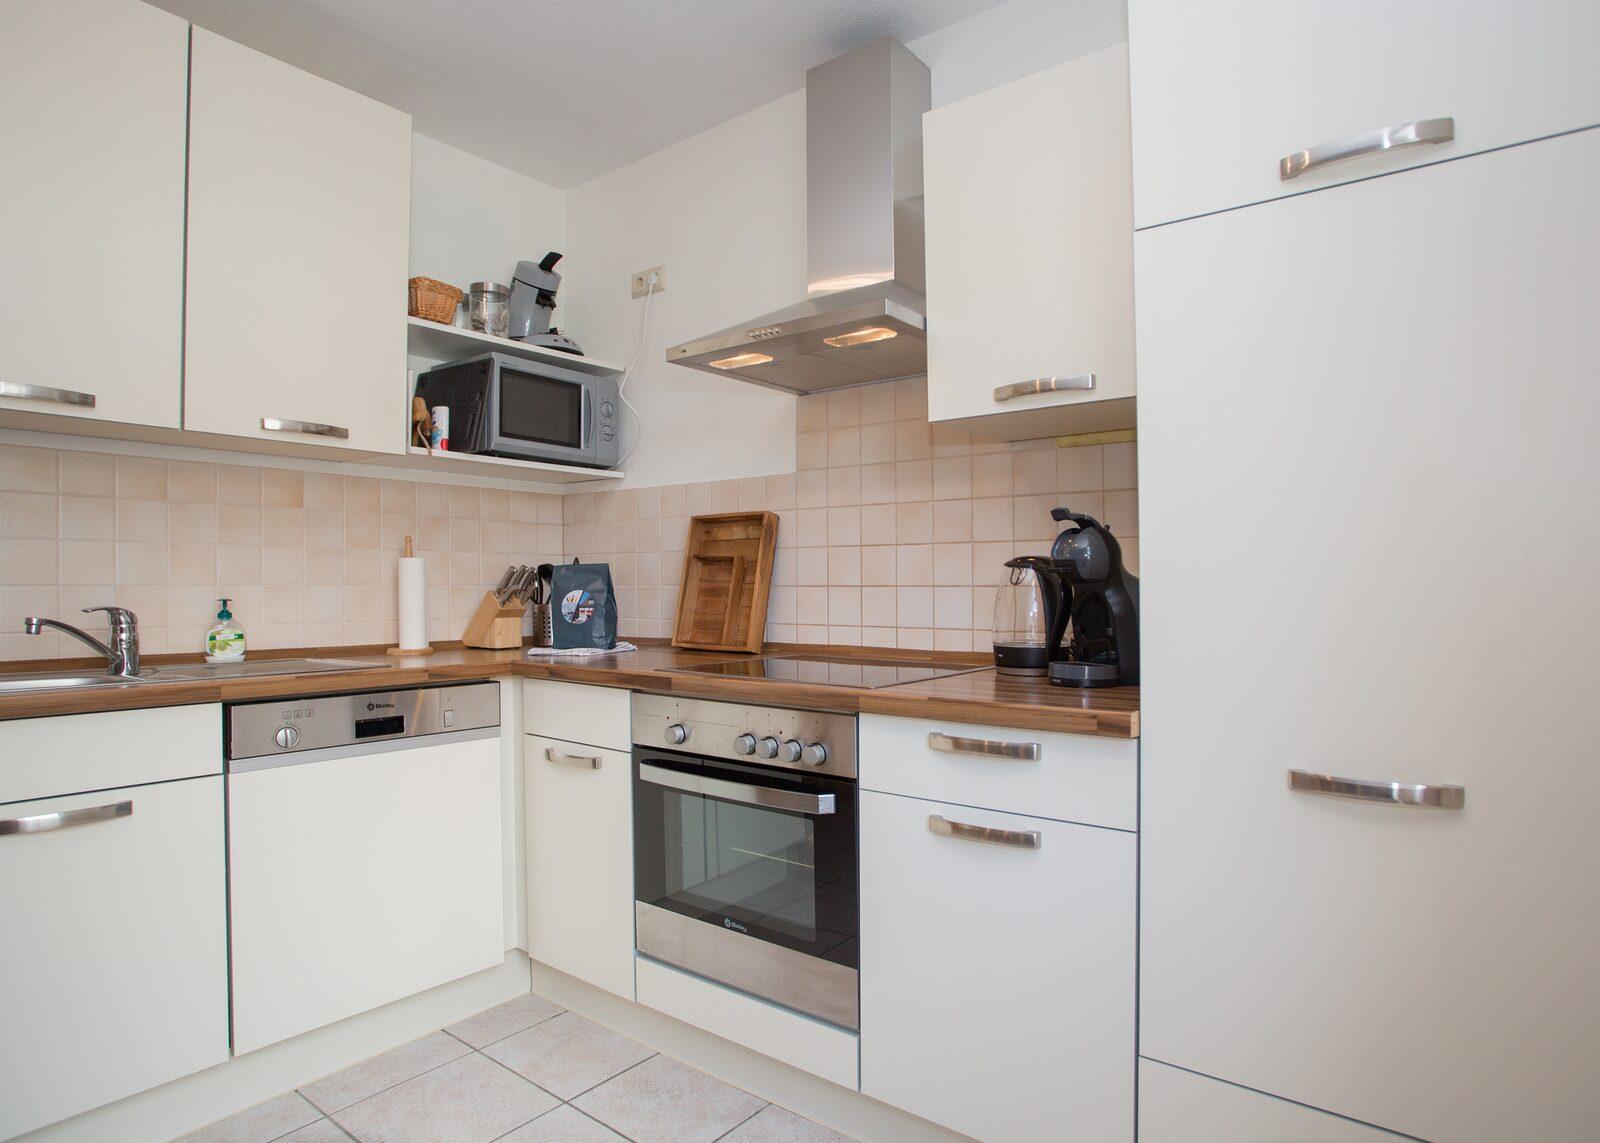 Appartement - Nuhnestrasse 2b | Winterberg - Eliza